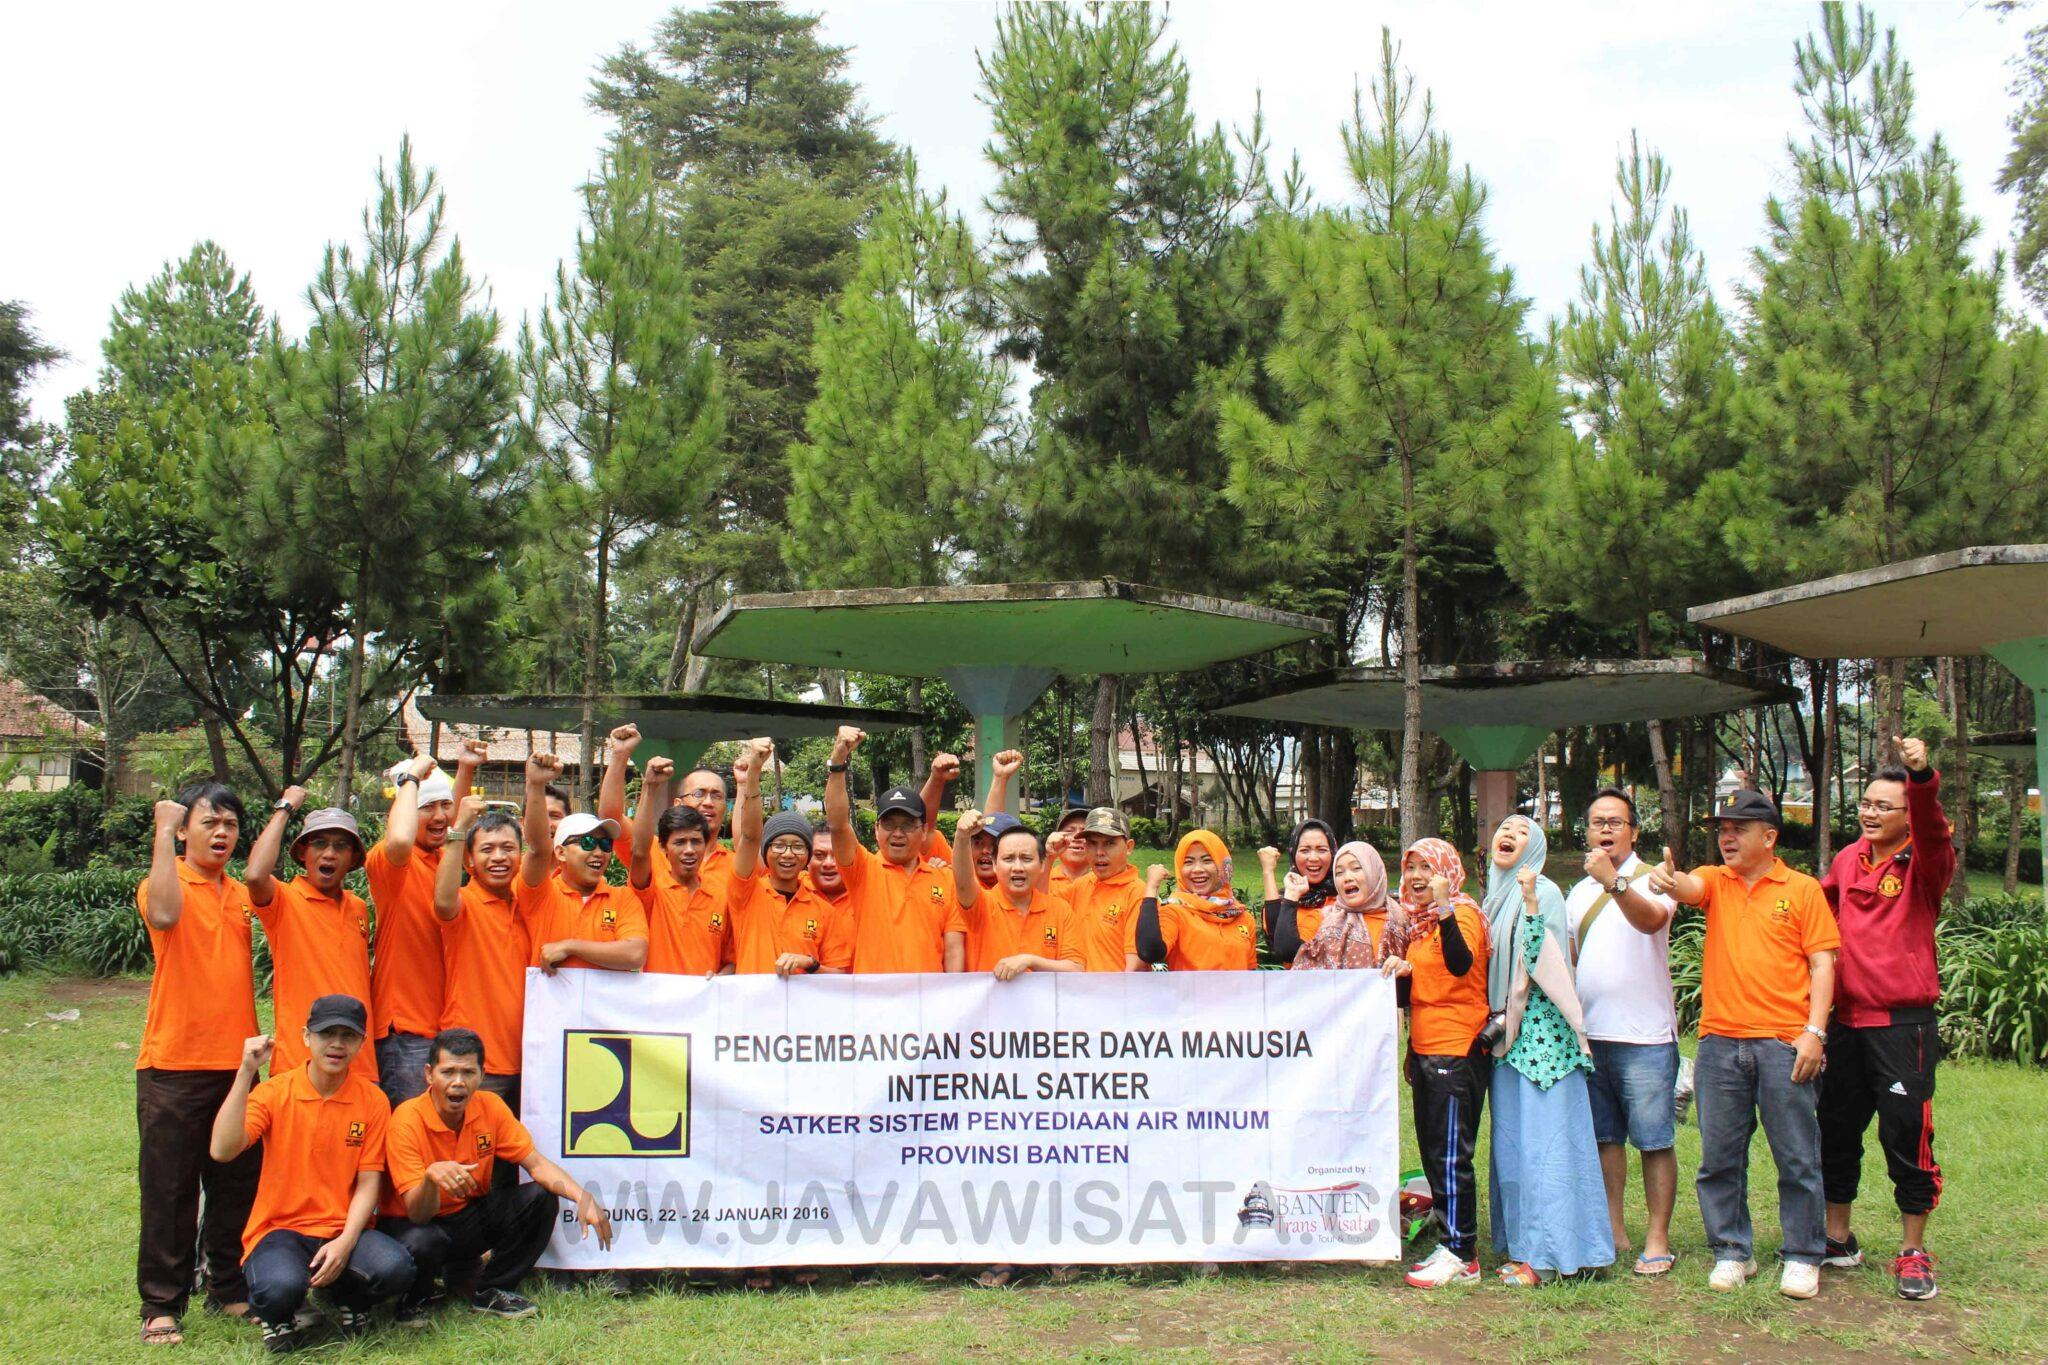 Outbound-Bandung-Java-Wisata-2